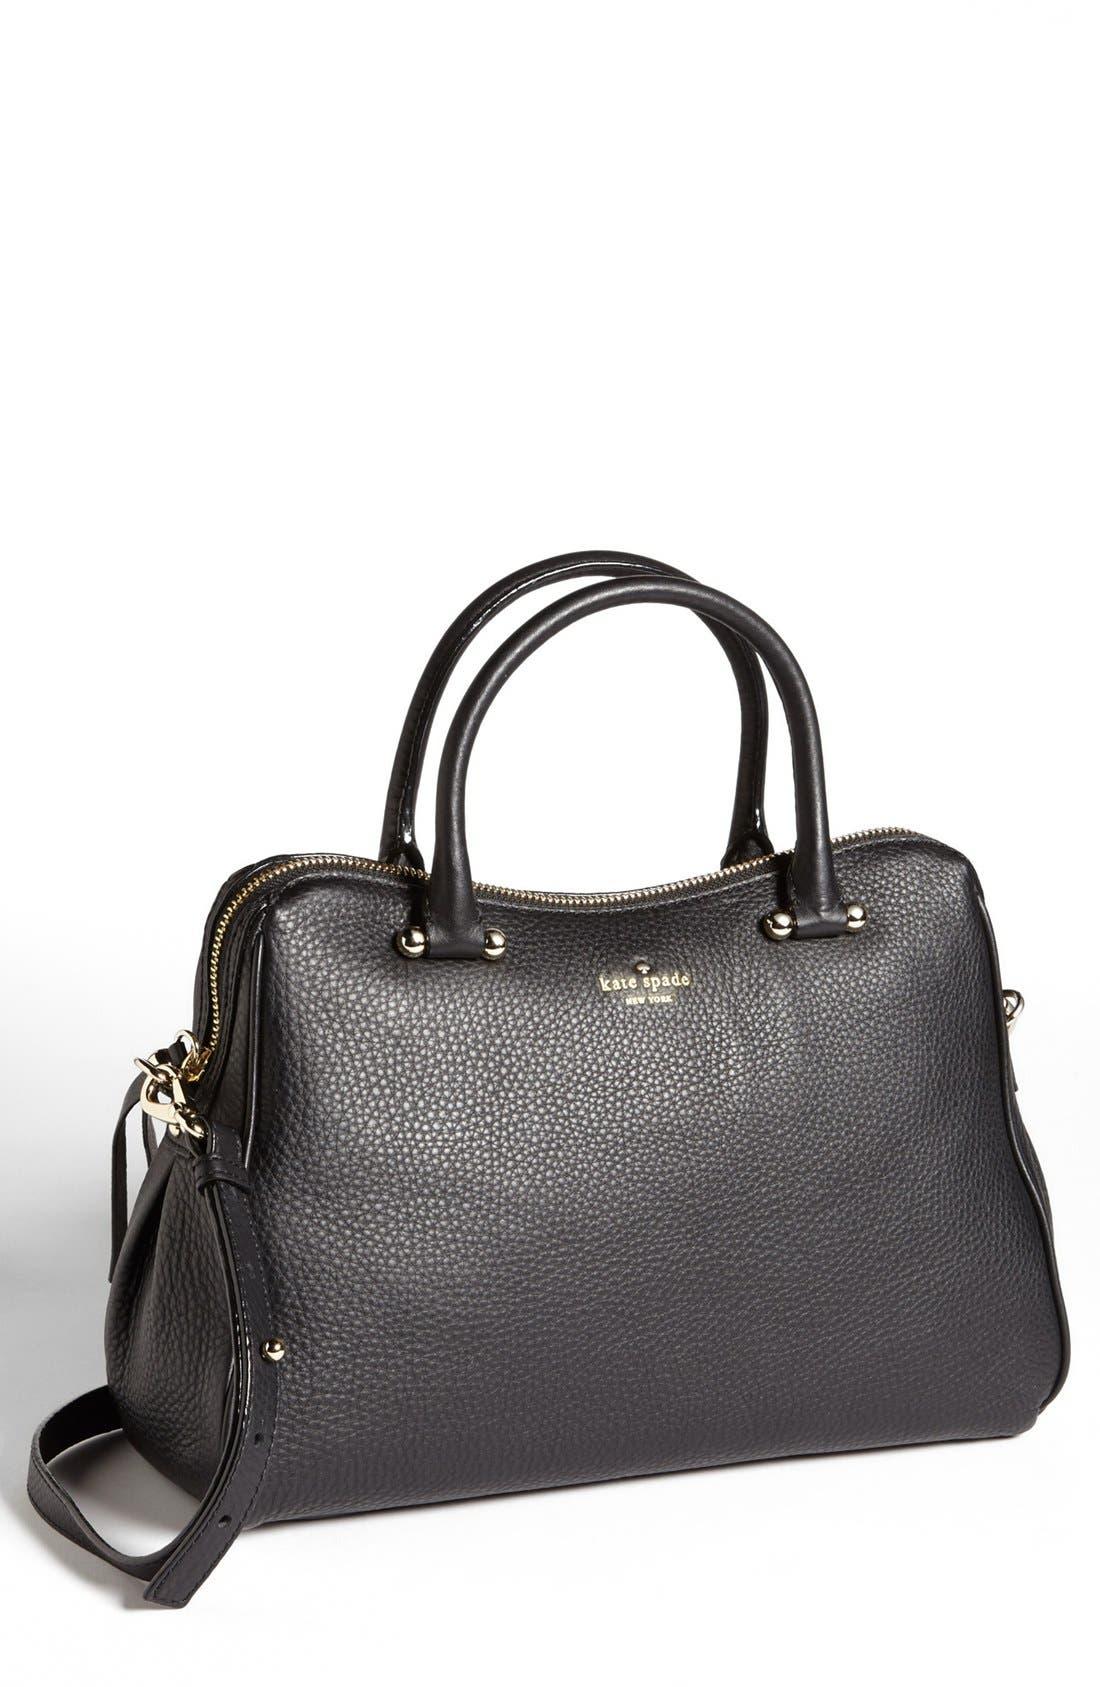 Main Image - kate spade new york 'charles street - audrey' leather satchel